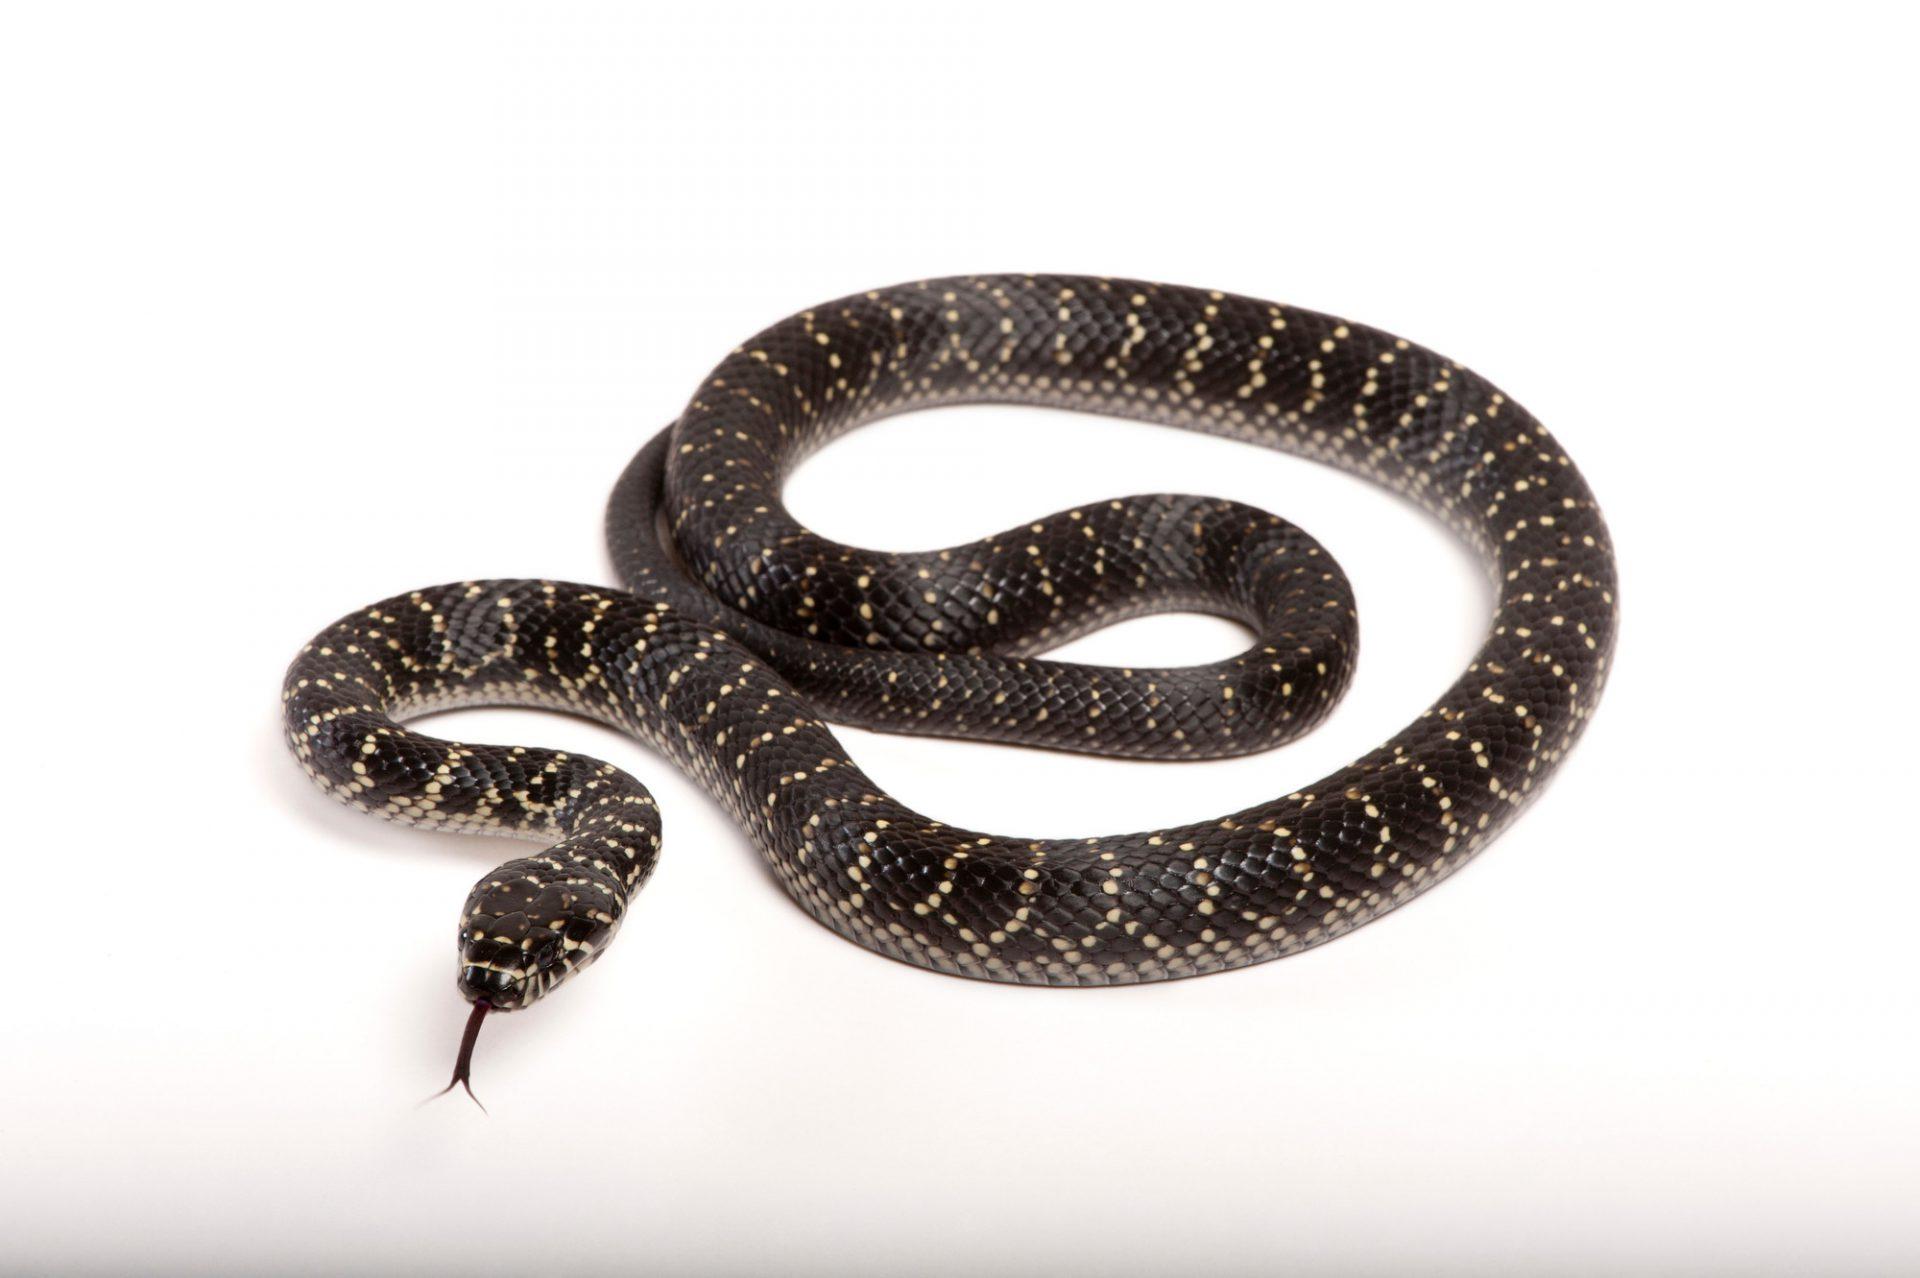 A vulnerable broad-headed snake (Hoplocephalus bungaroides) at the Healesville Sanctuary in Healesville, Victoria, Australia